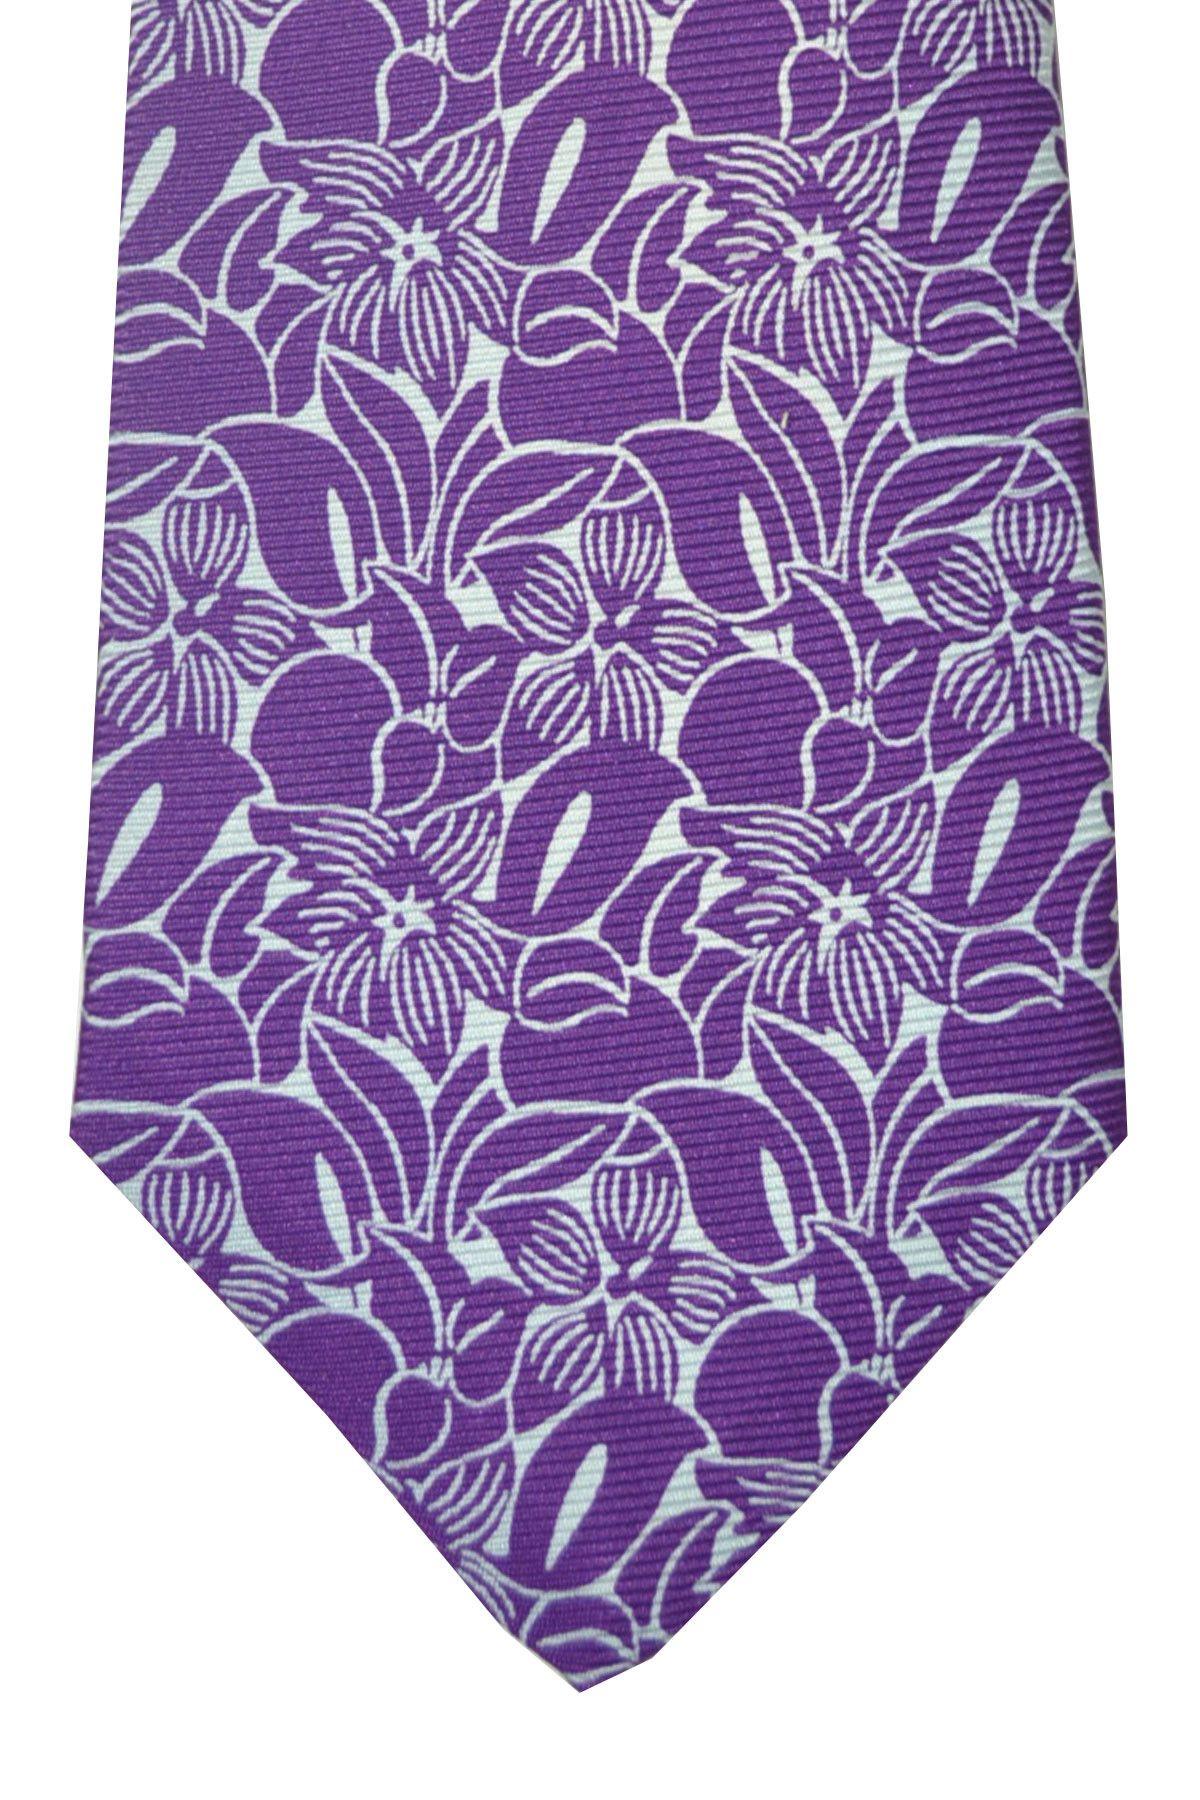 Beautiful purple floral Kiton tie, sevenfold